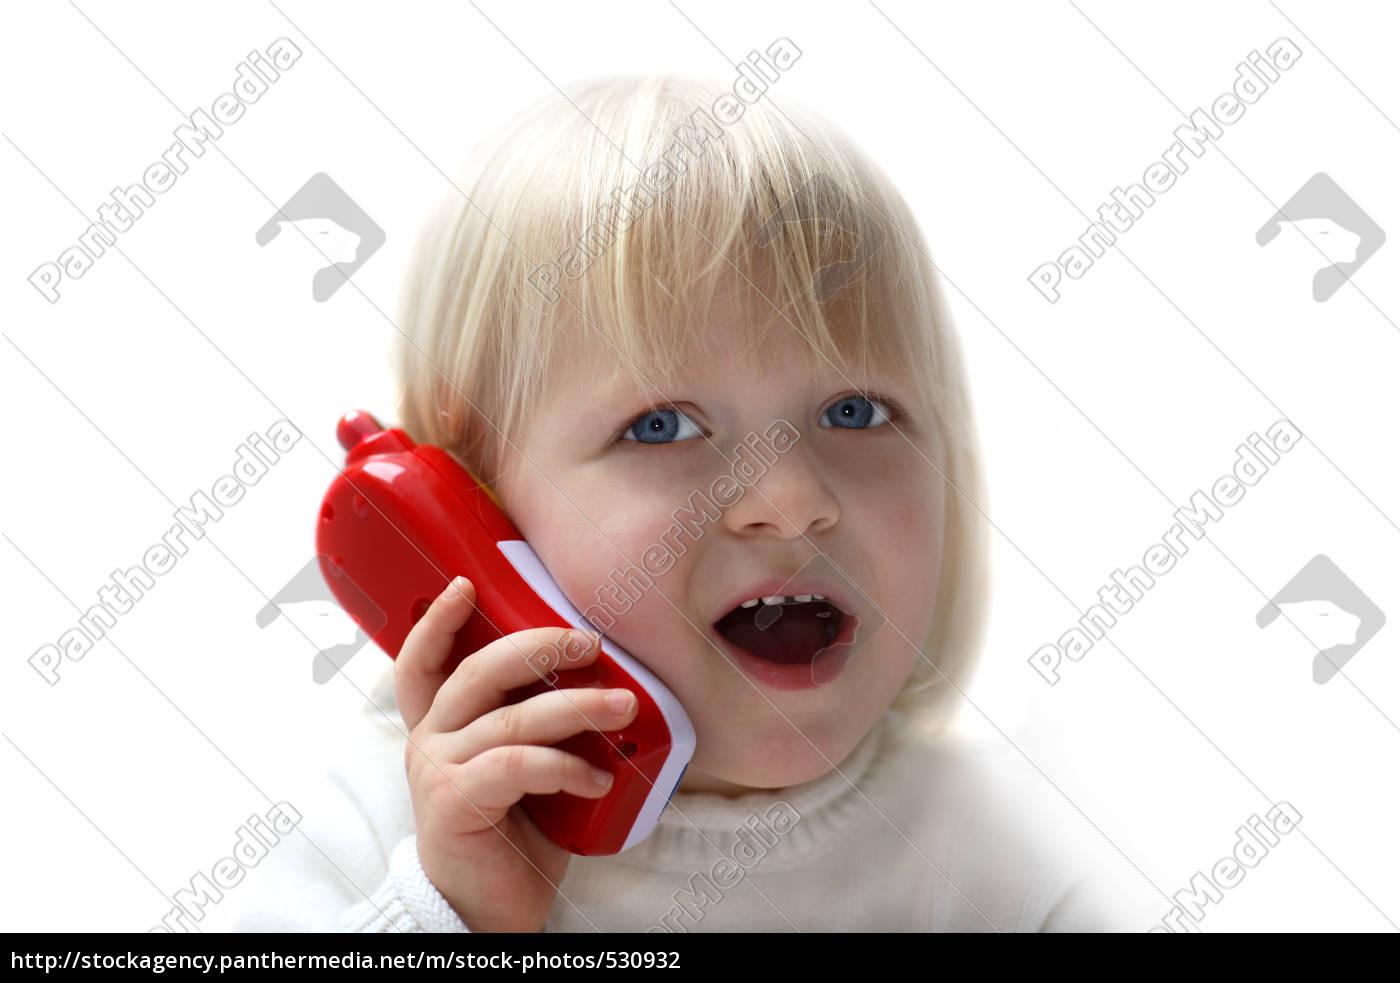 phone - 530932